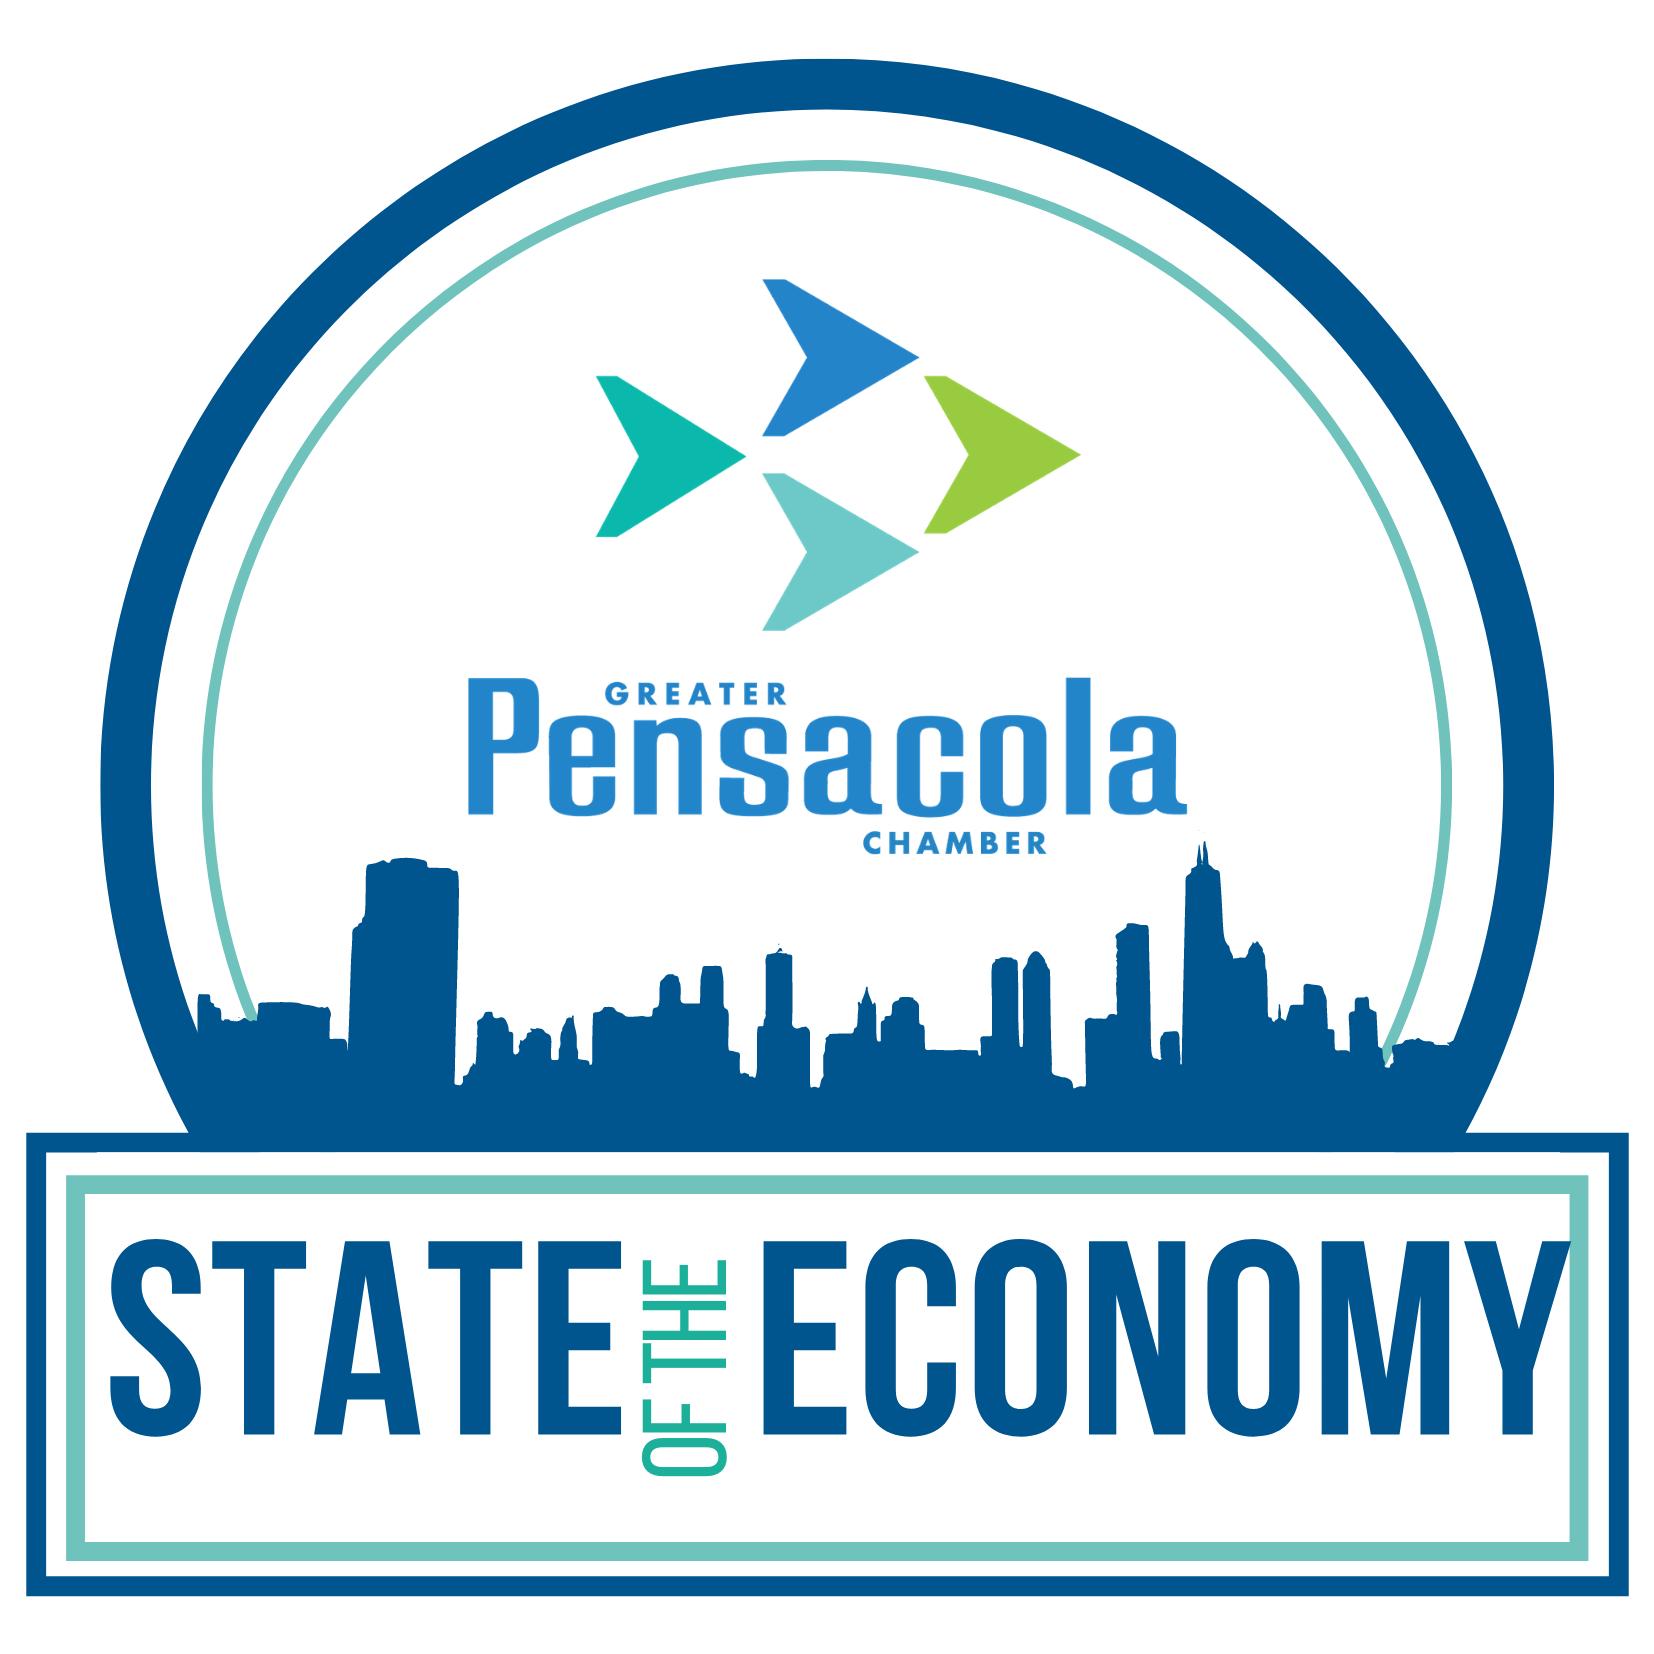 state of economy